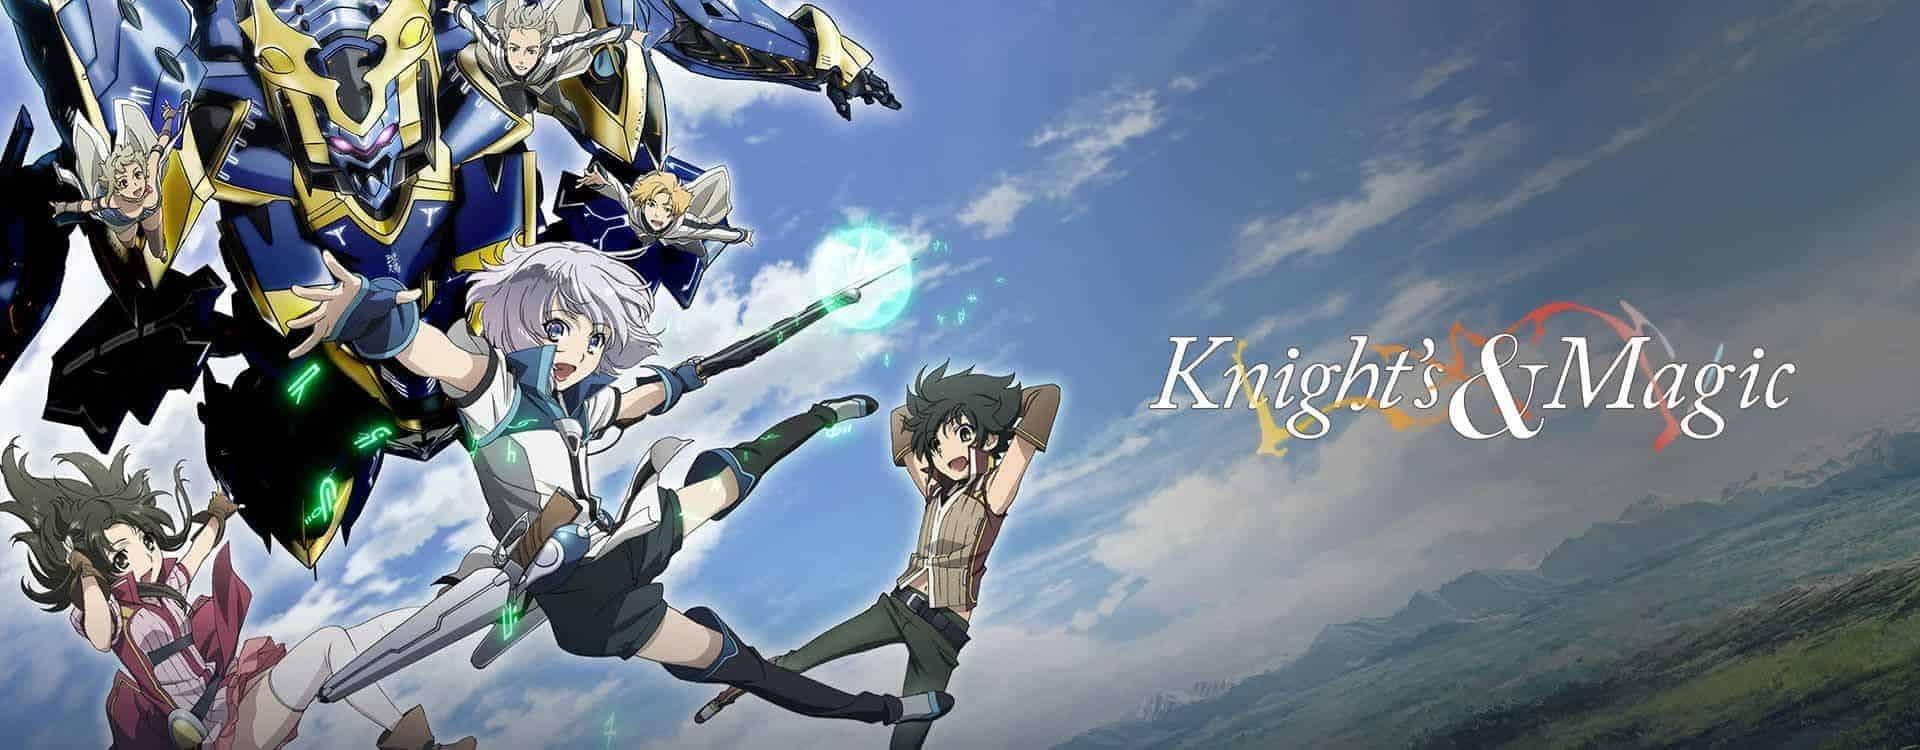 Knight's and Magic